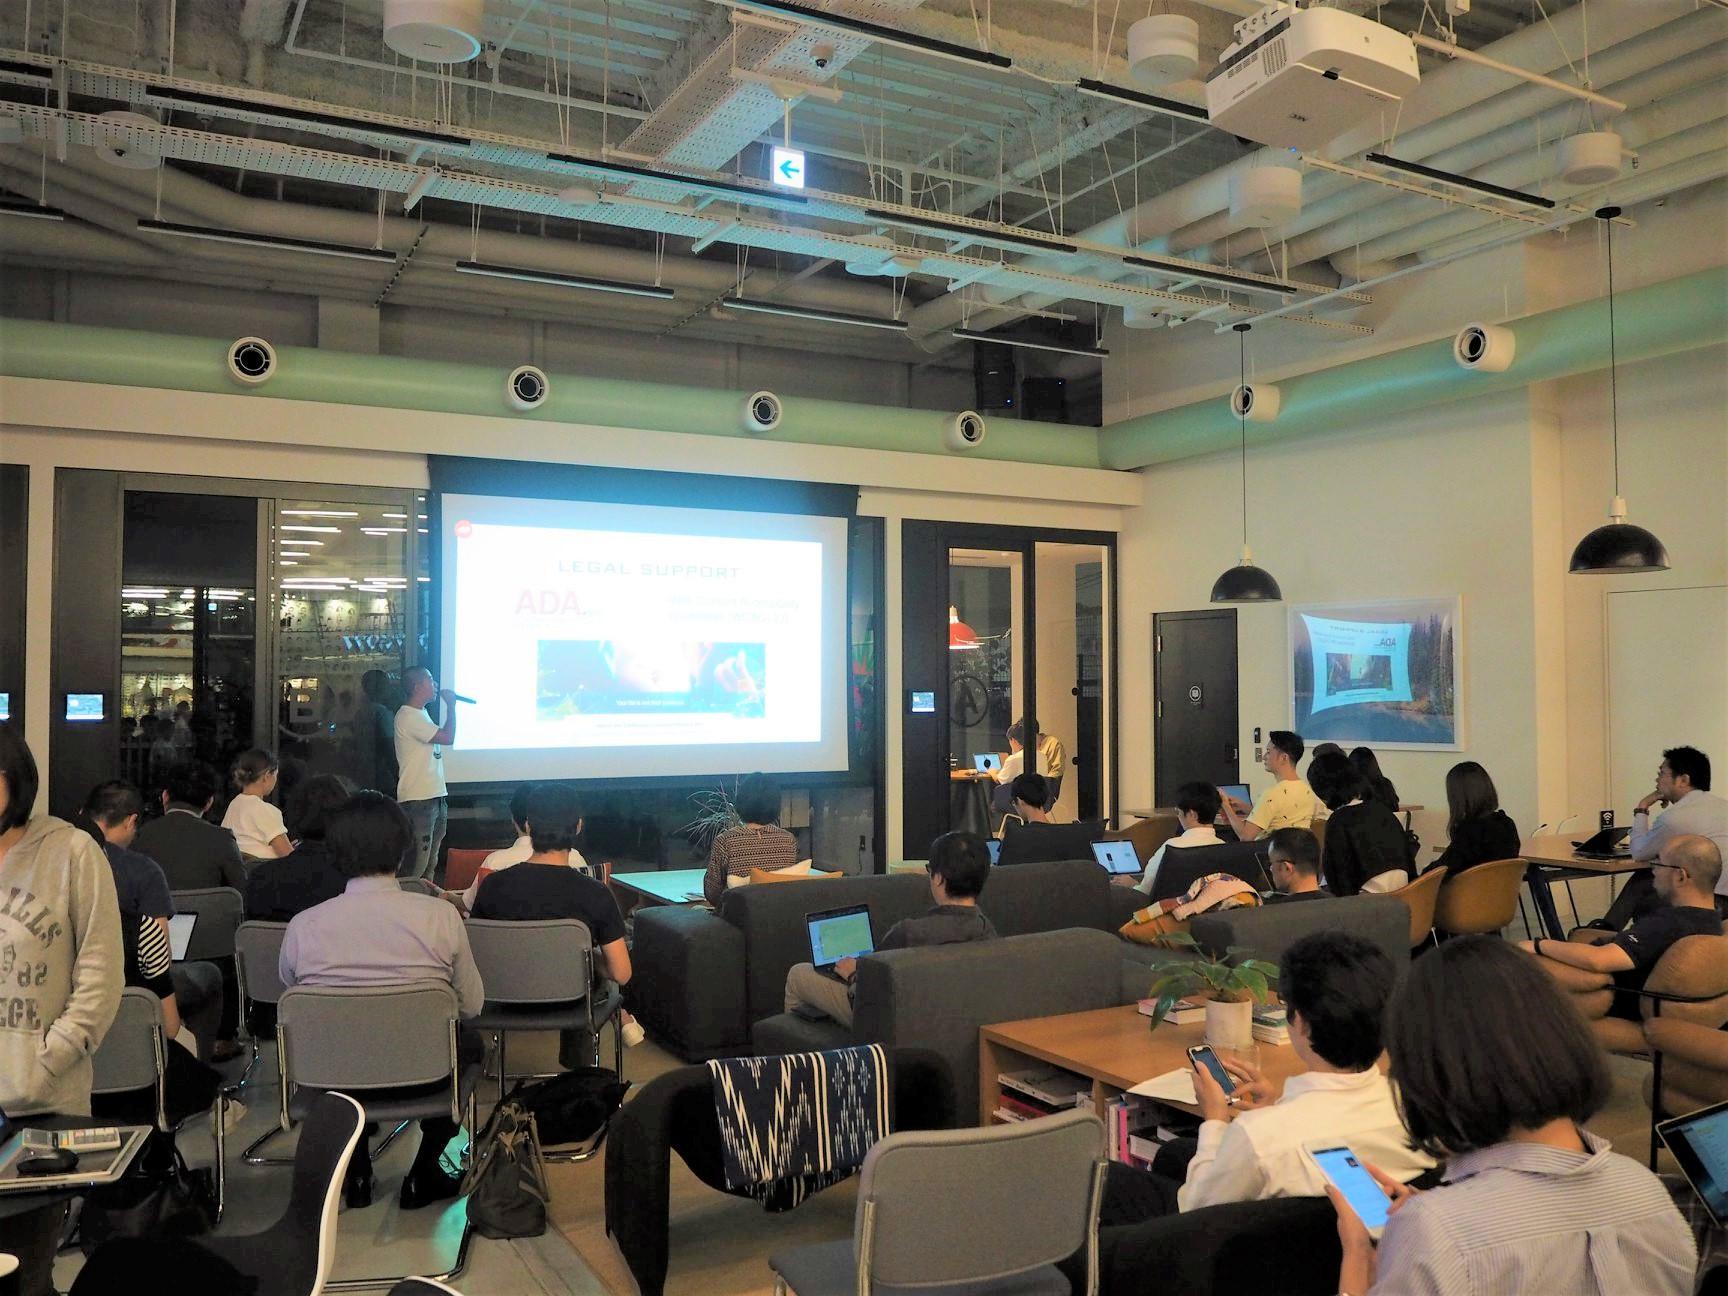 【#ShopifyMeetup セミナーレポート】「LINE活用×越境EC」をテーマに東京・横浜で開催